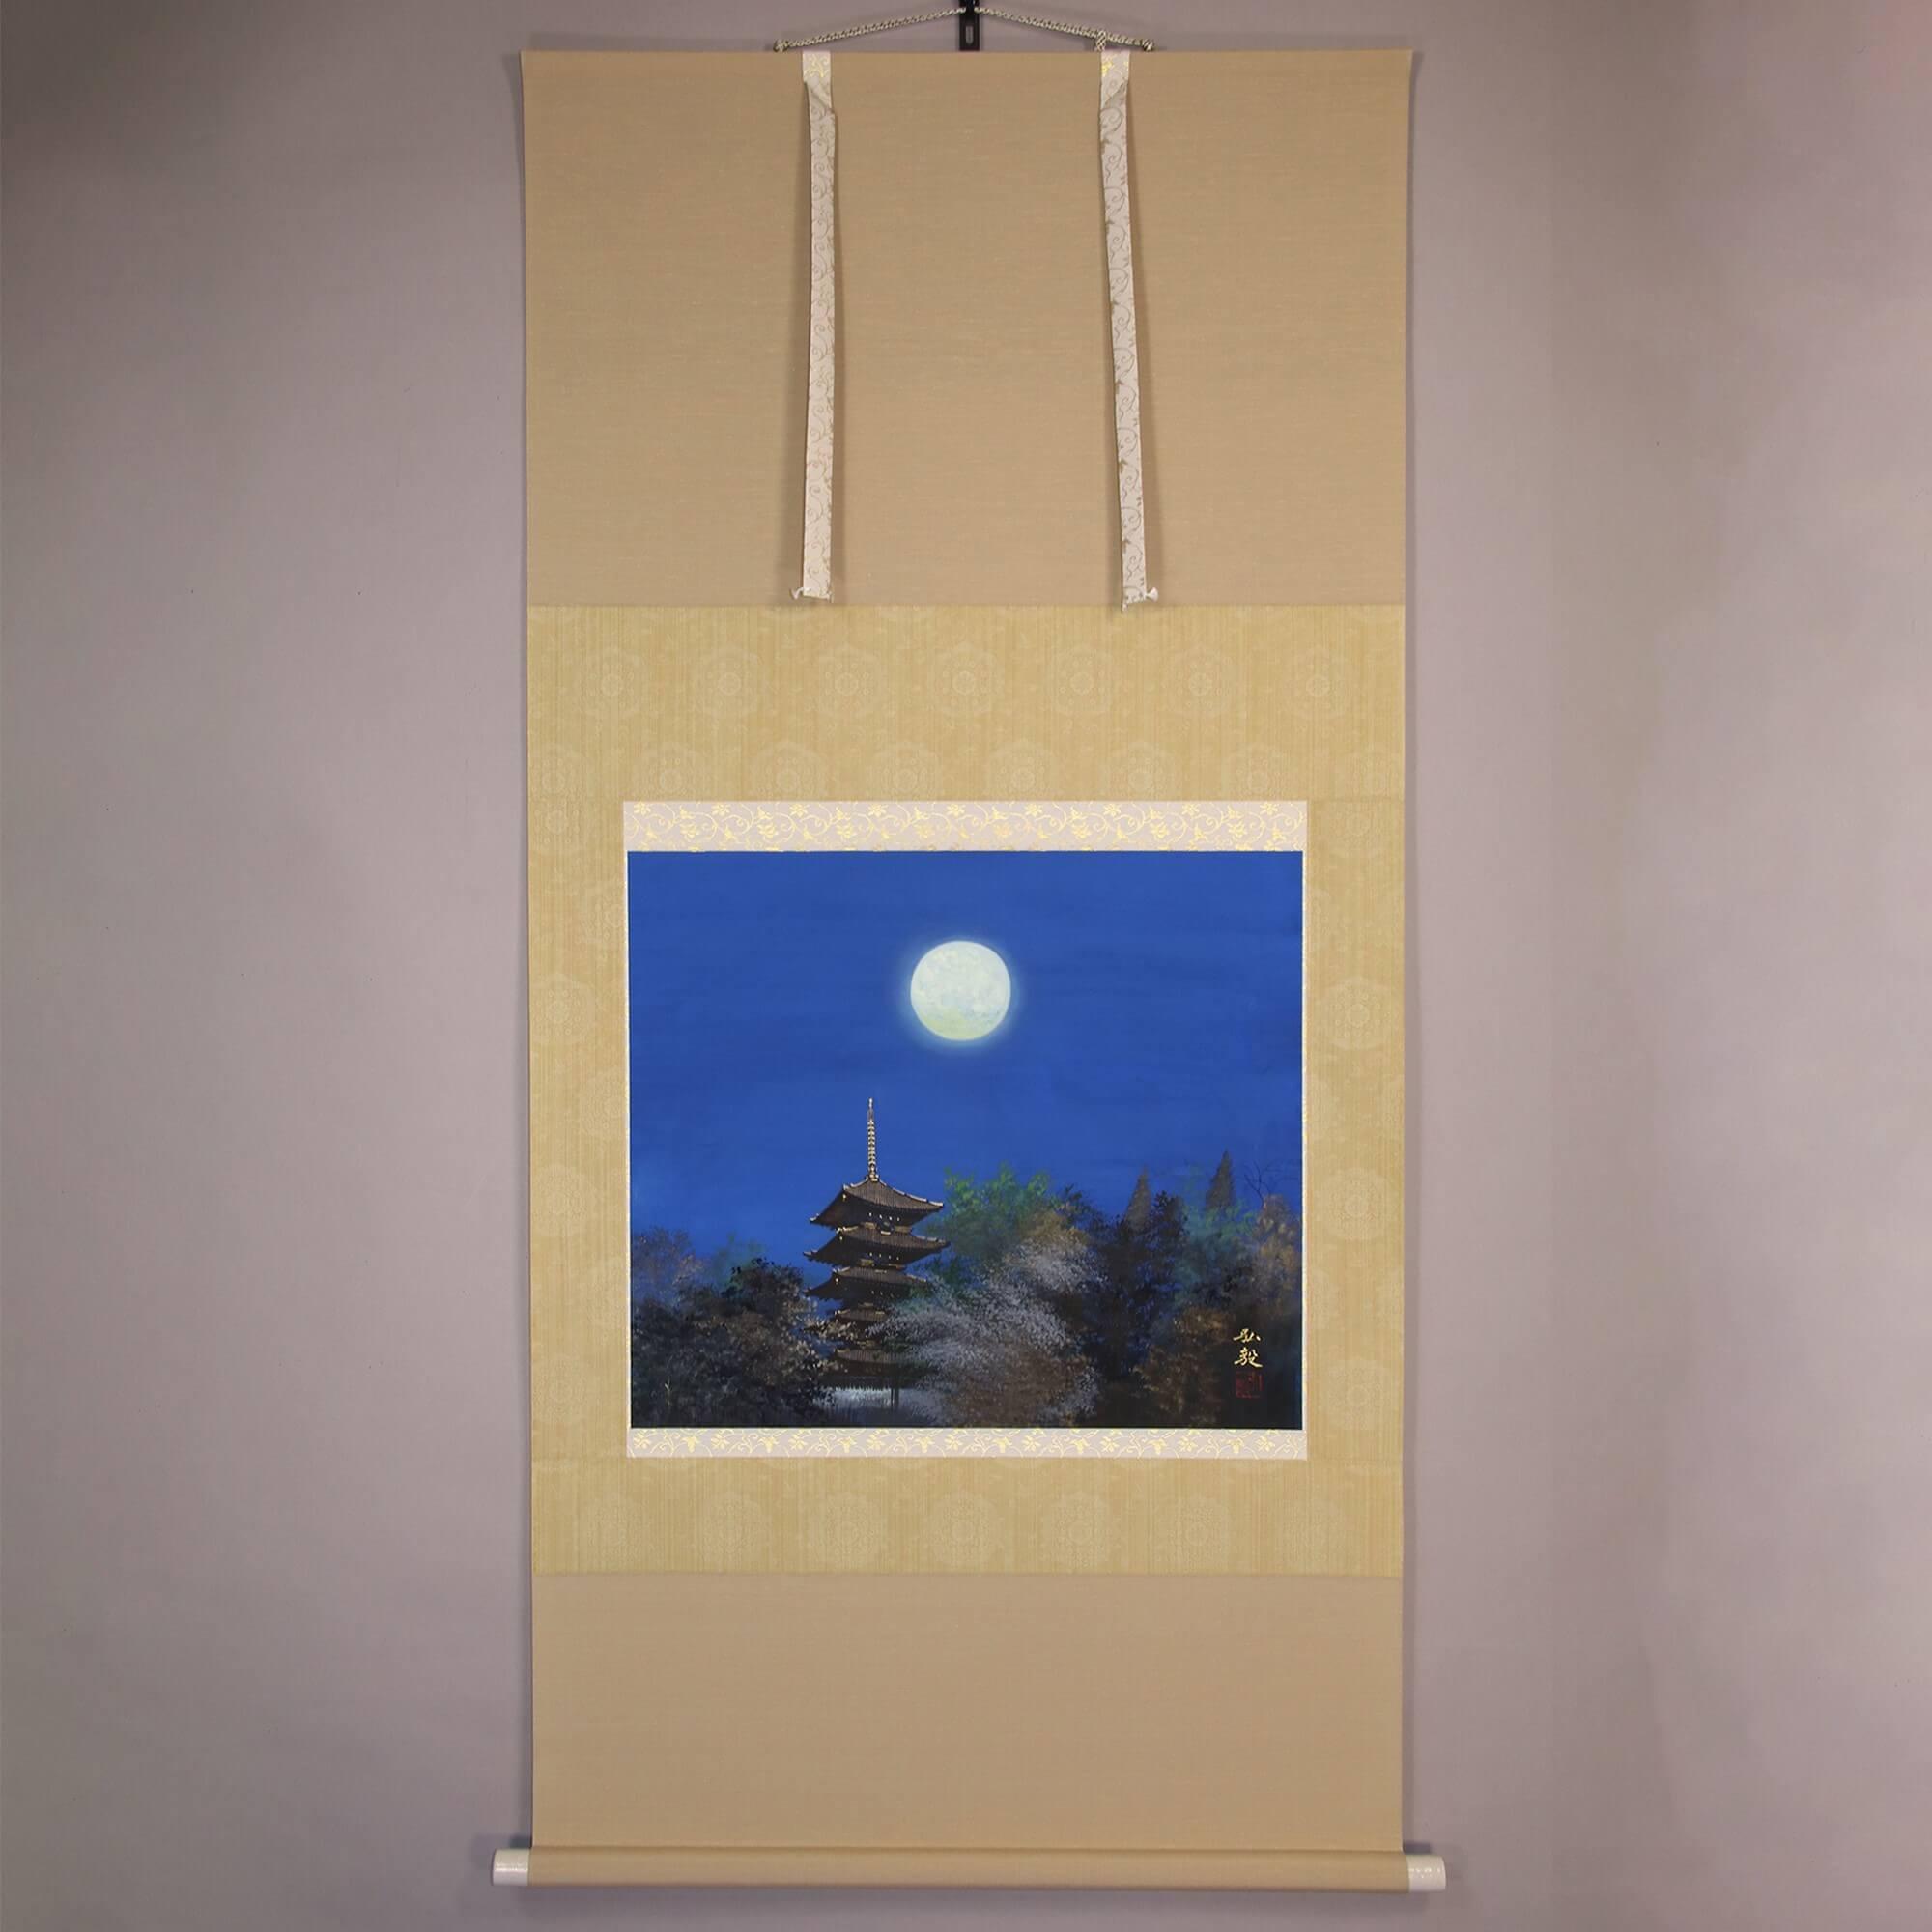 Moonlight / Usui Hiroki